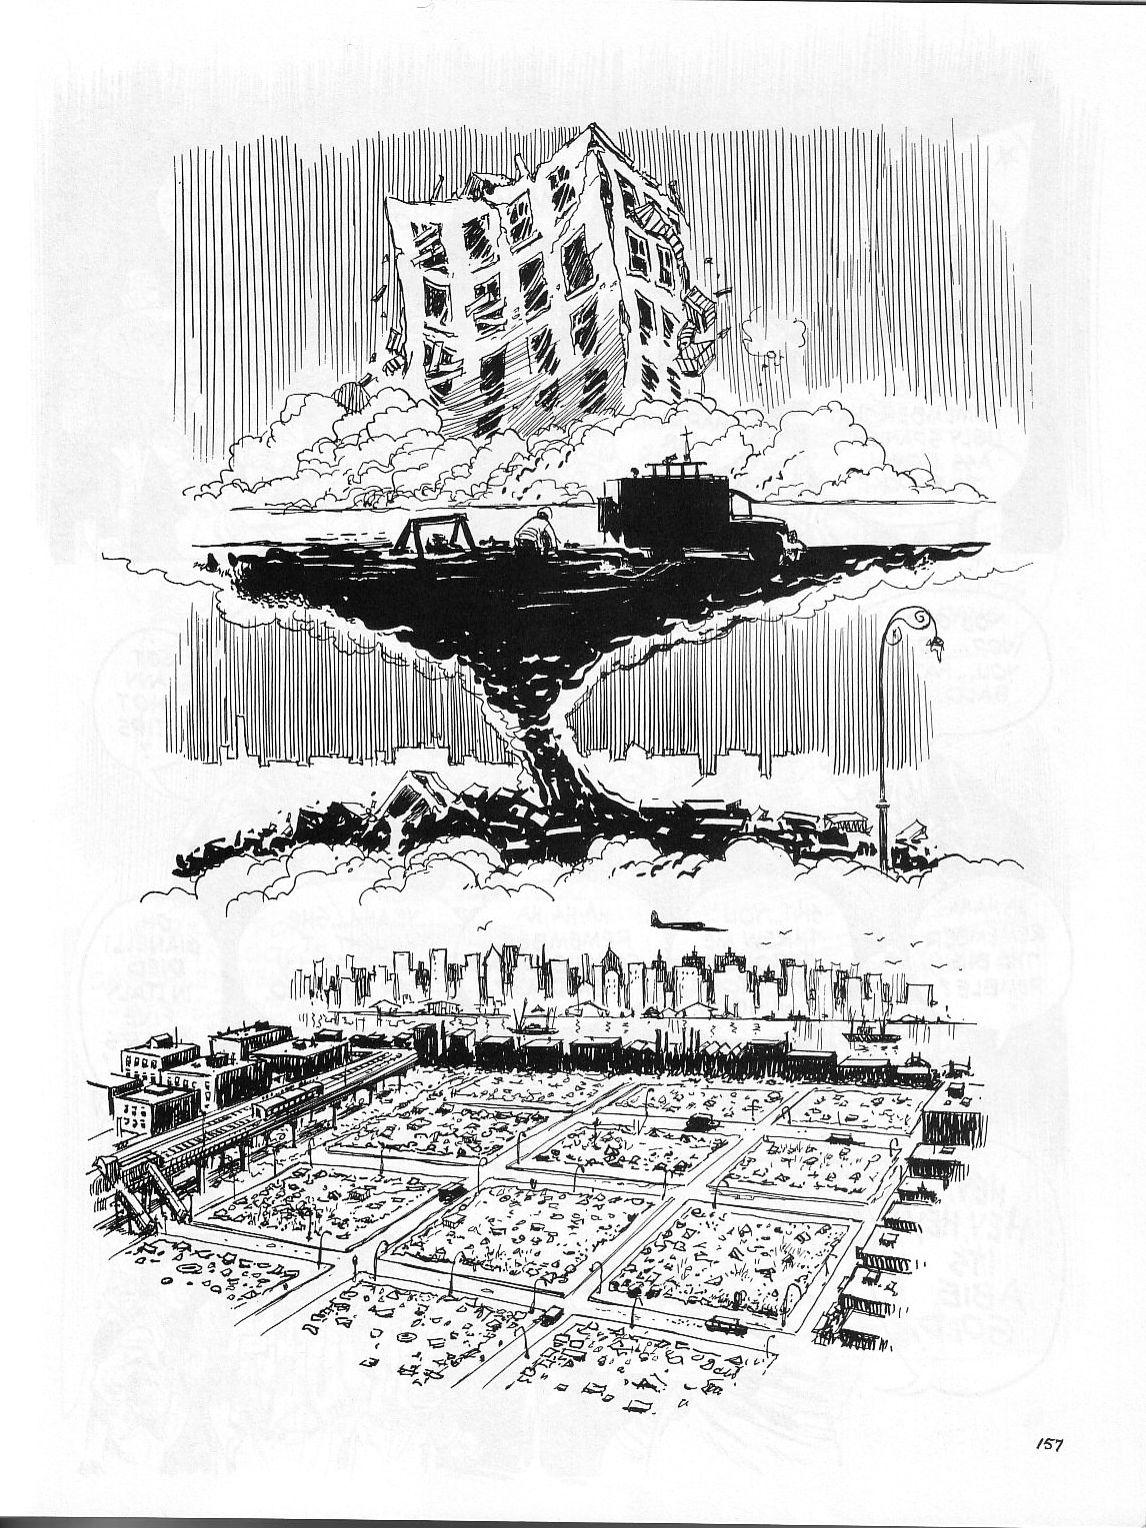 Read online Dropsie Avenue, The Neighborhood comic -  Issue # Full - 159